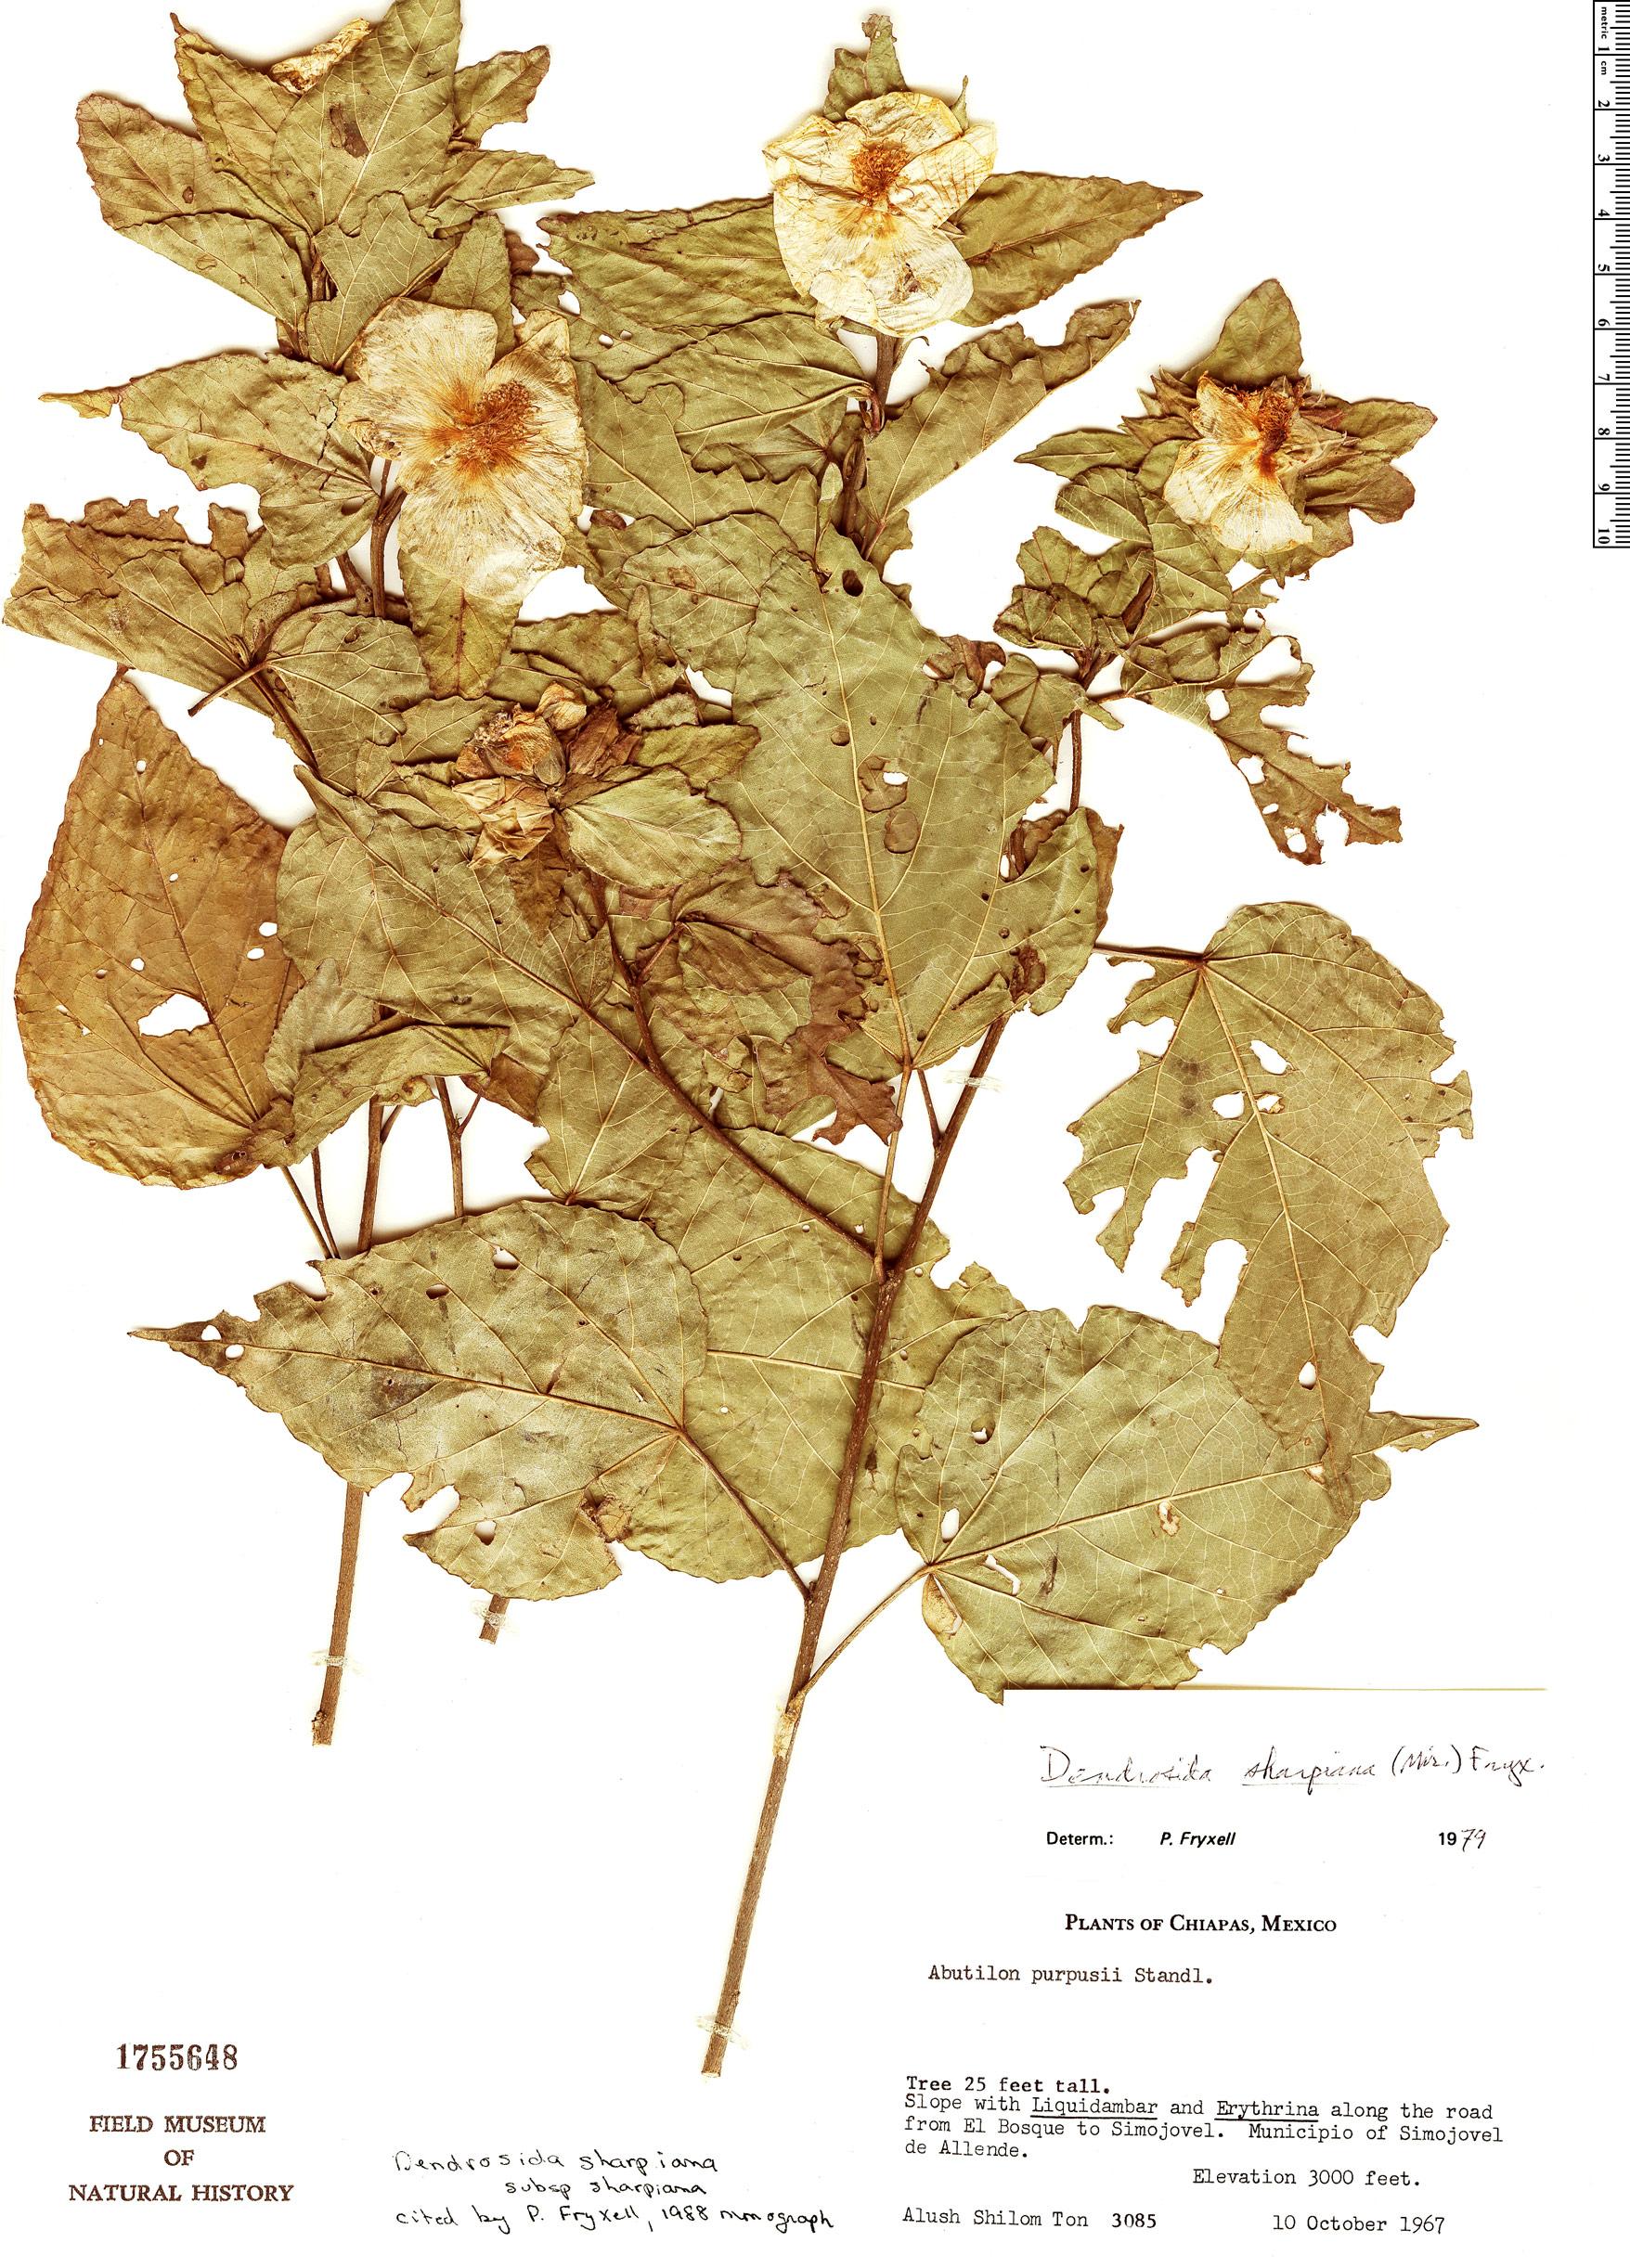 Specimen: Dendrosida sharpiana